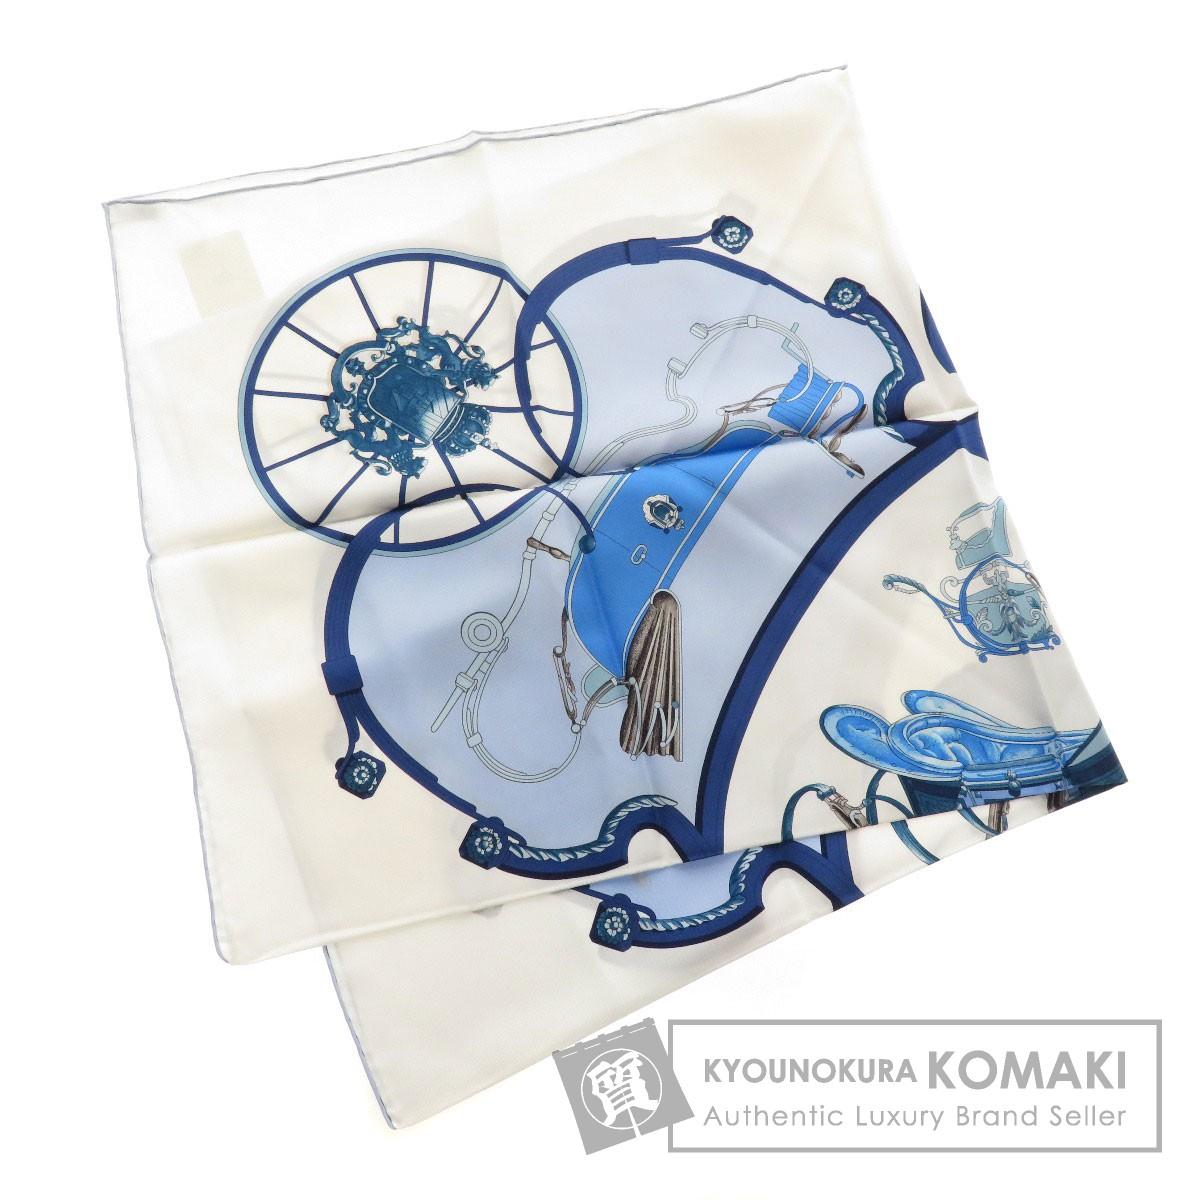 HERMES カレ90 Springs 馬車 スカーフ シルク レディース 【中古】【エルメス】